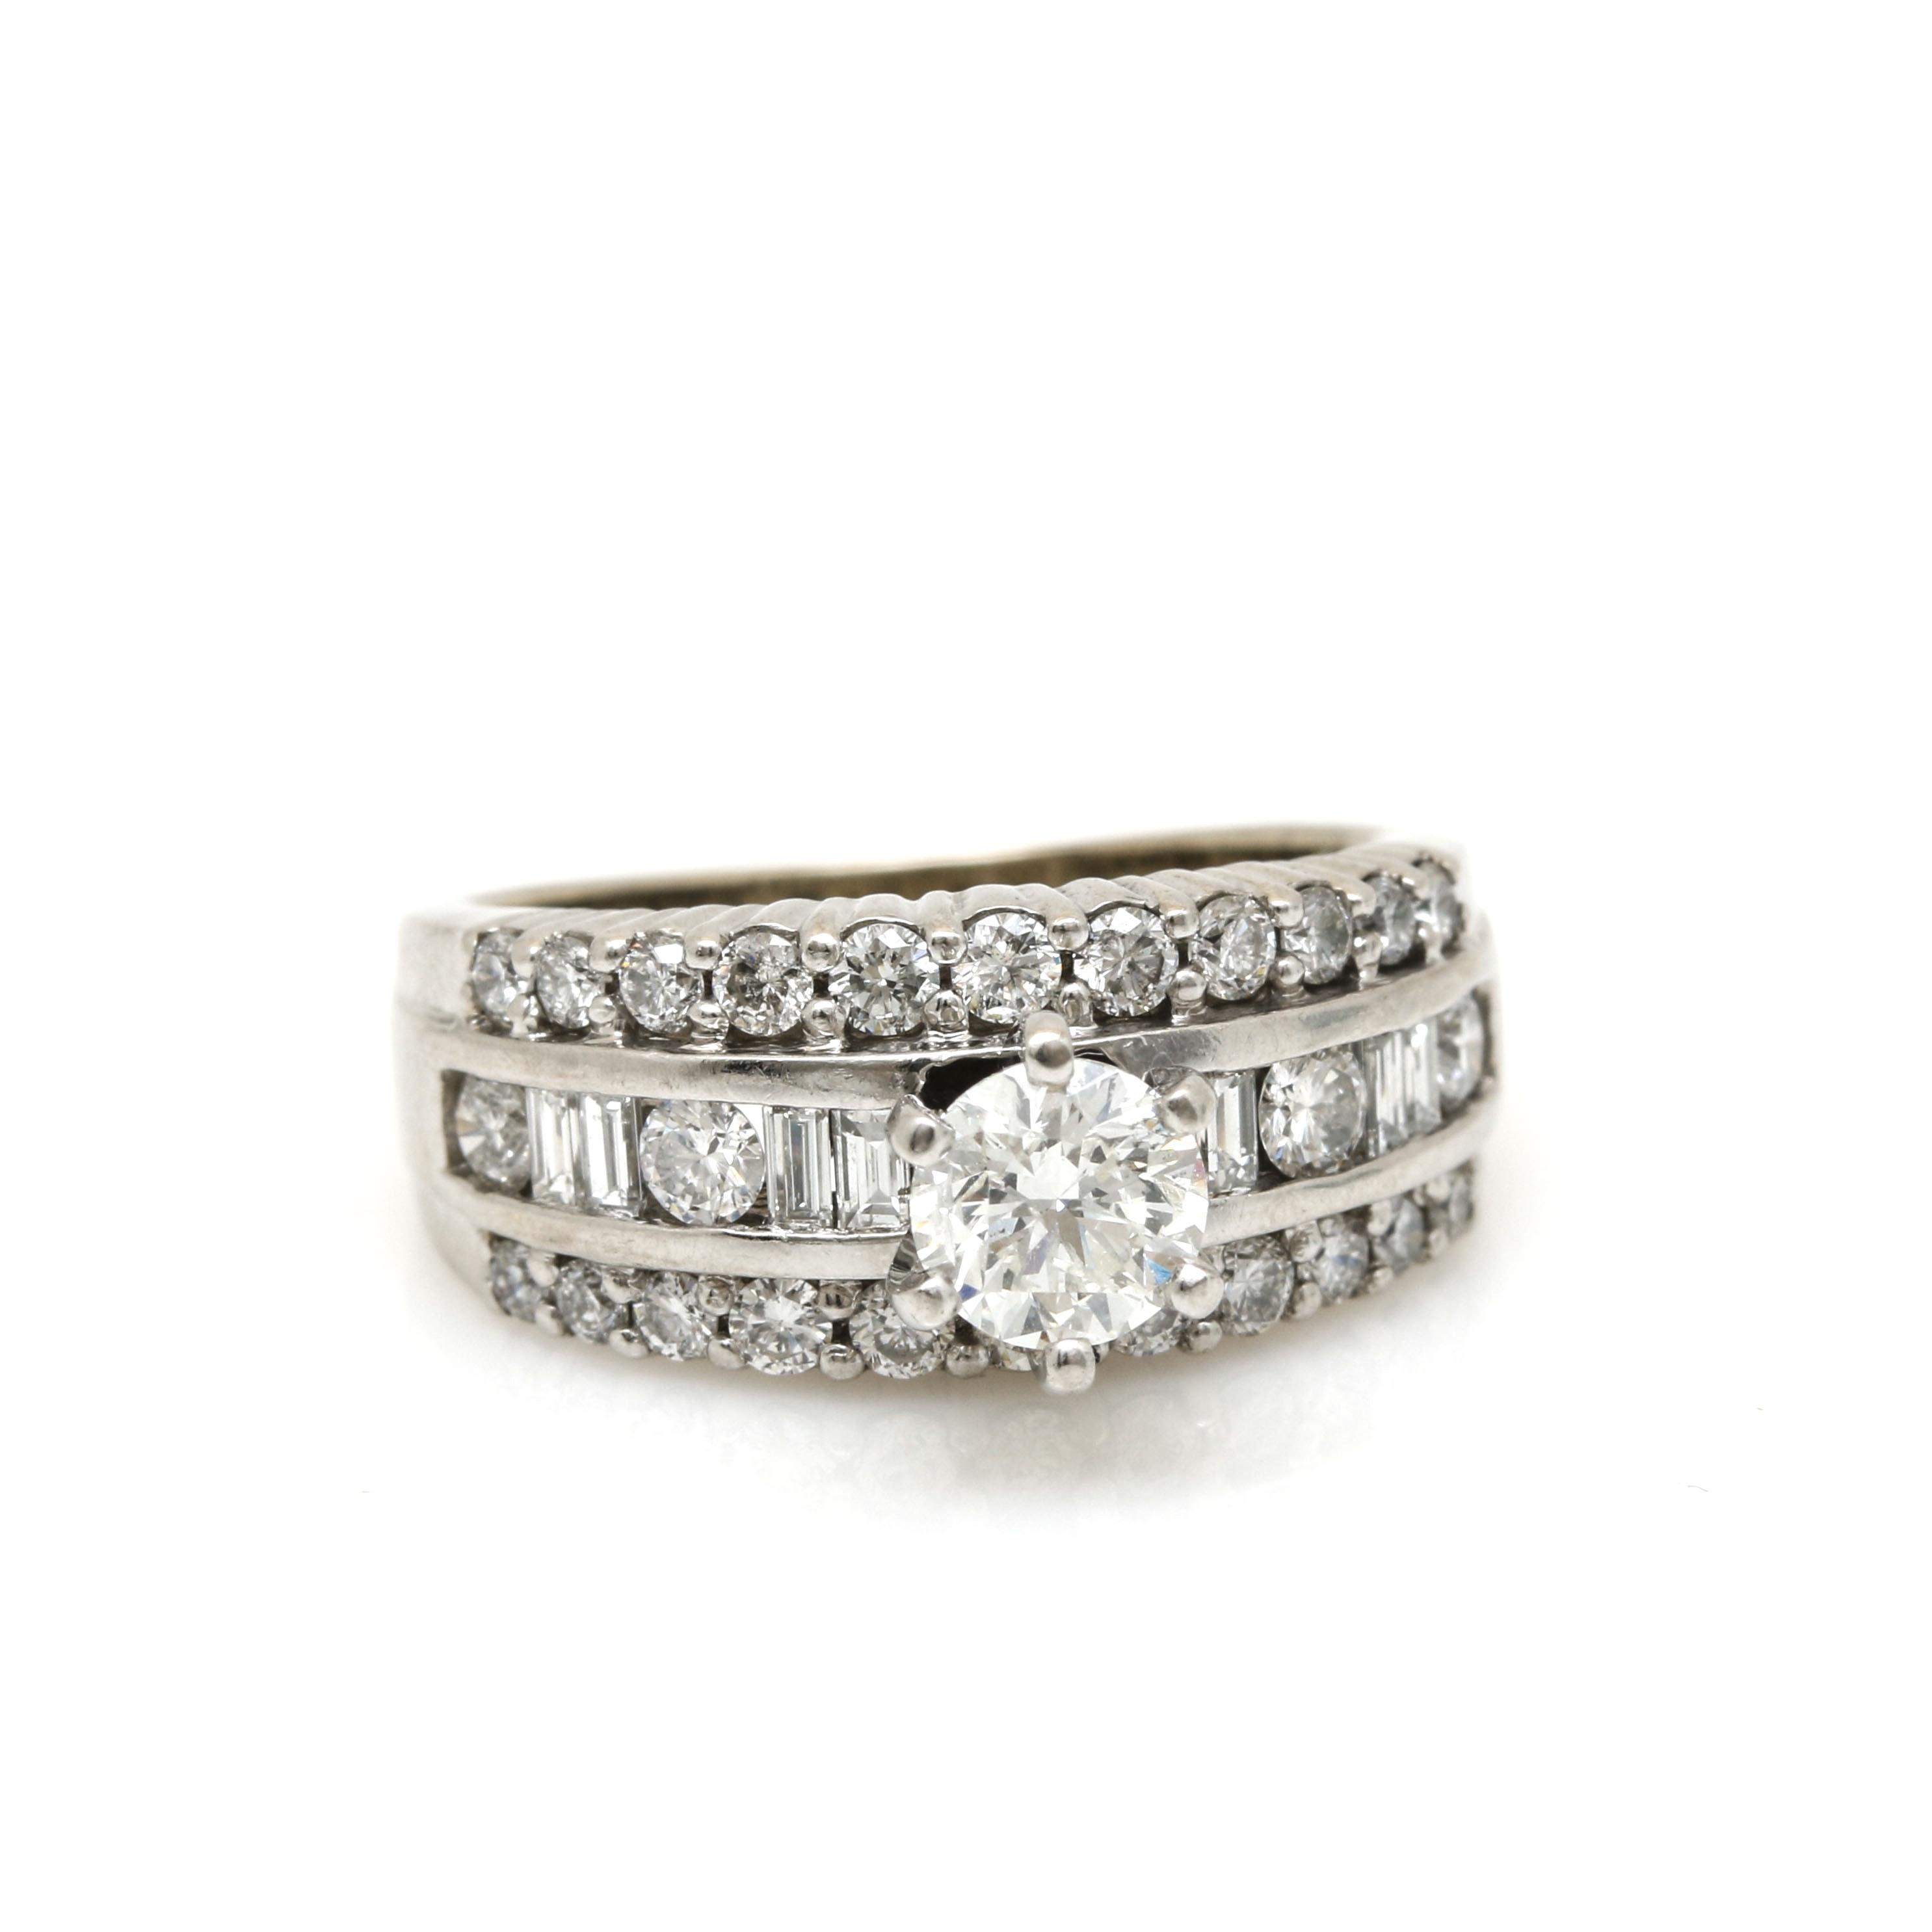 14K White Gold 1.54 CTW Diamond Ring